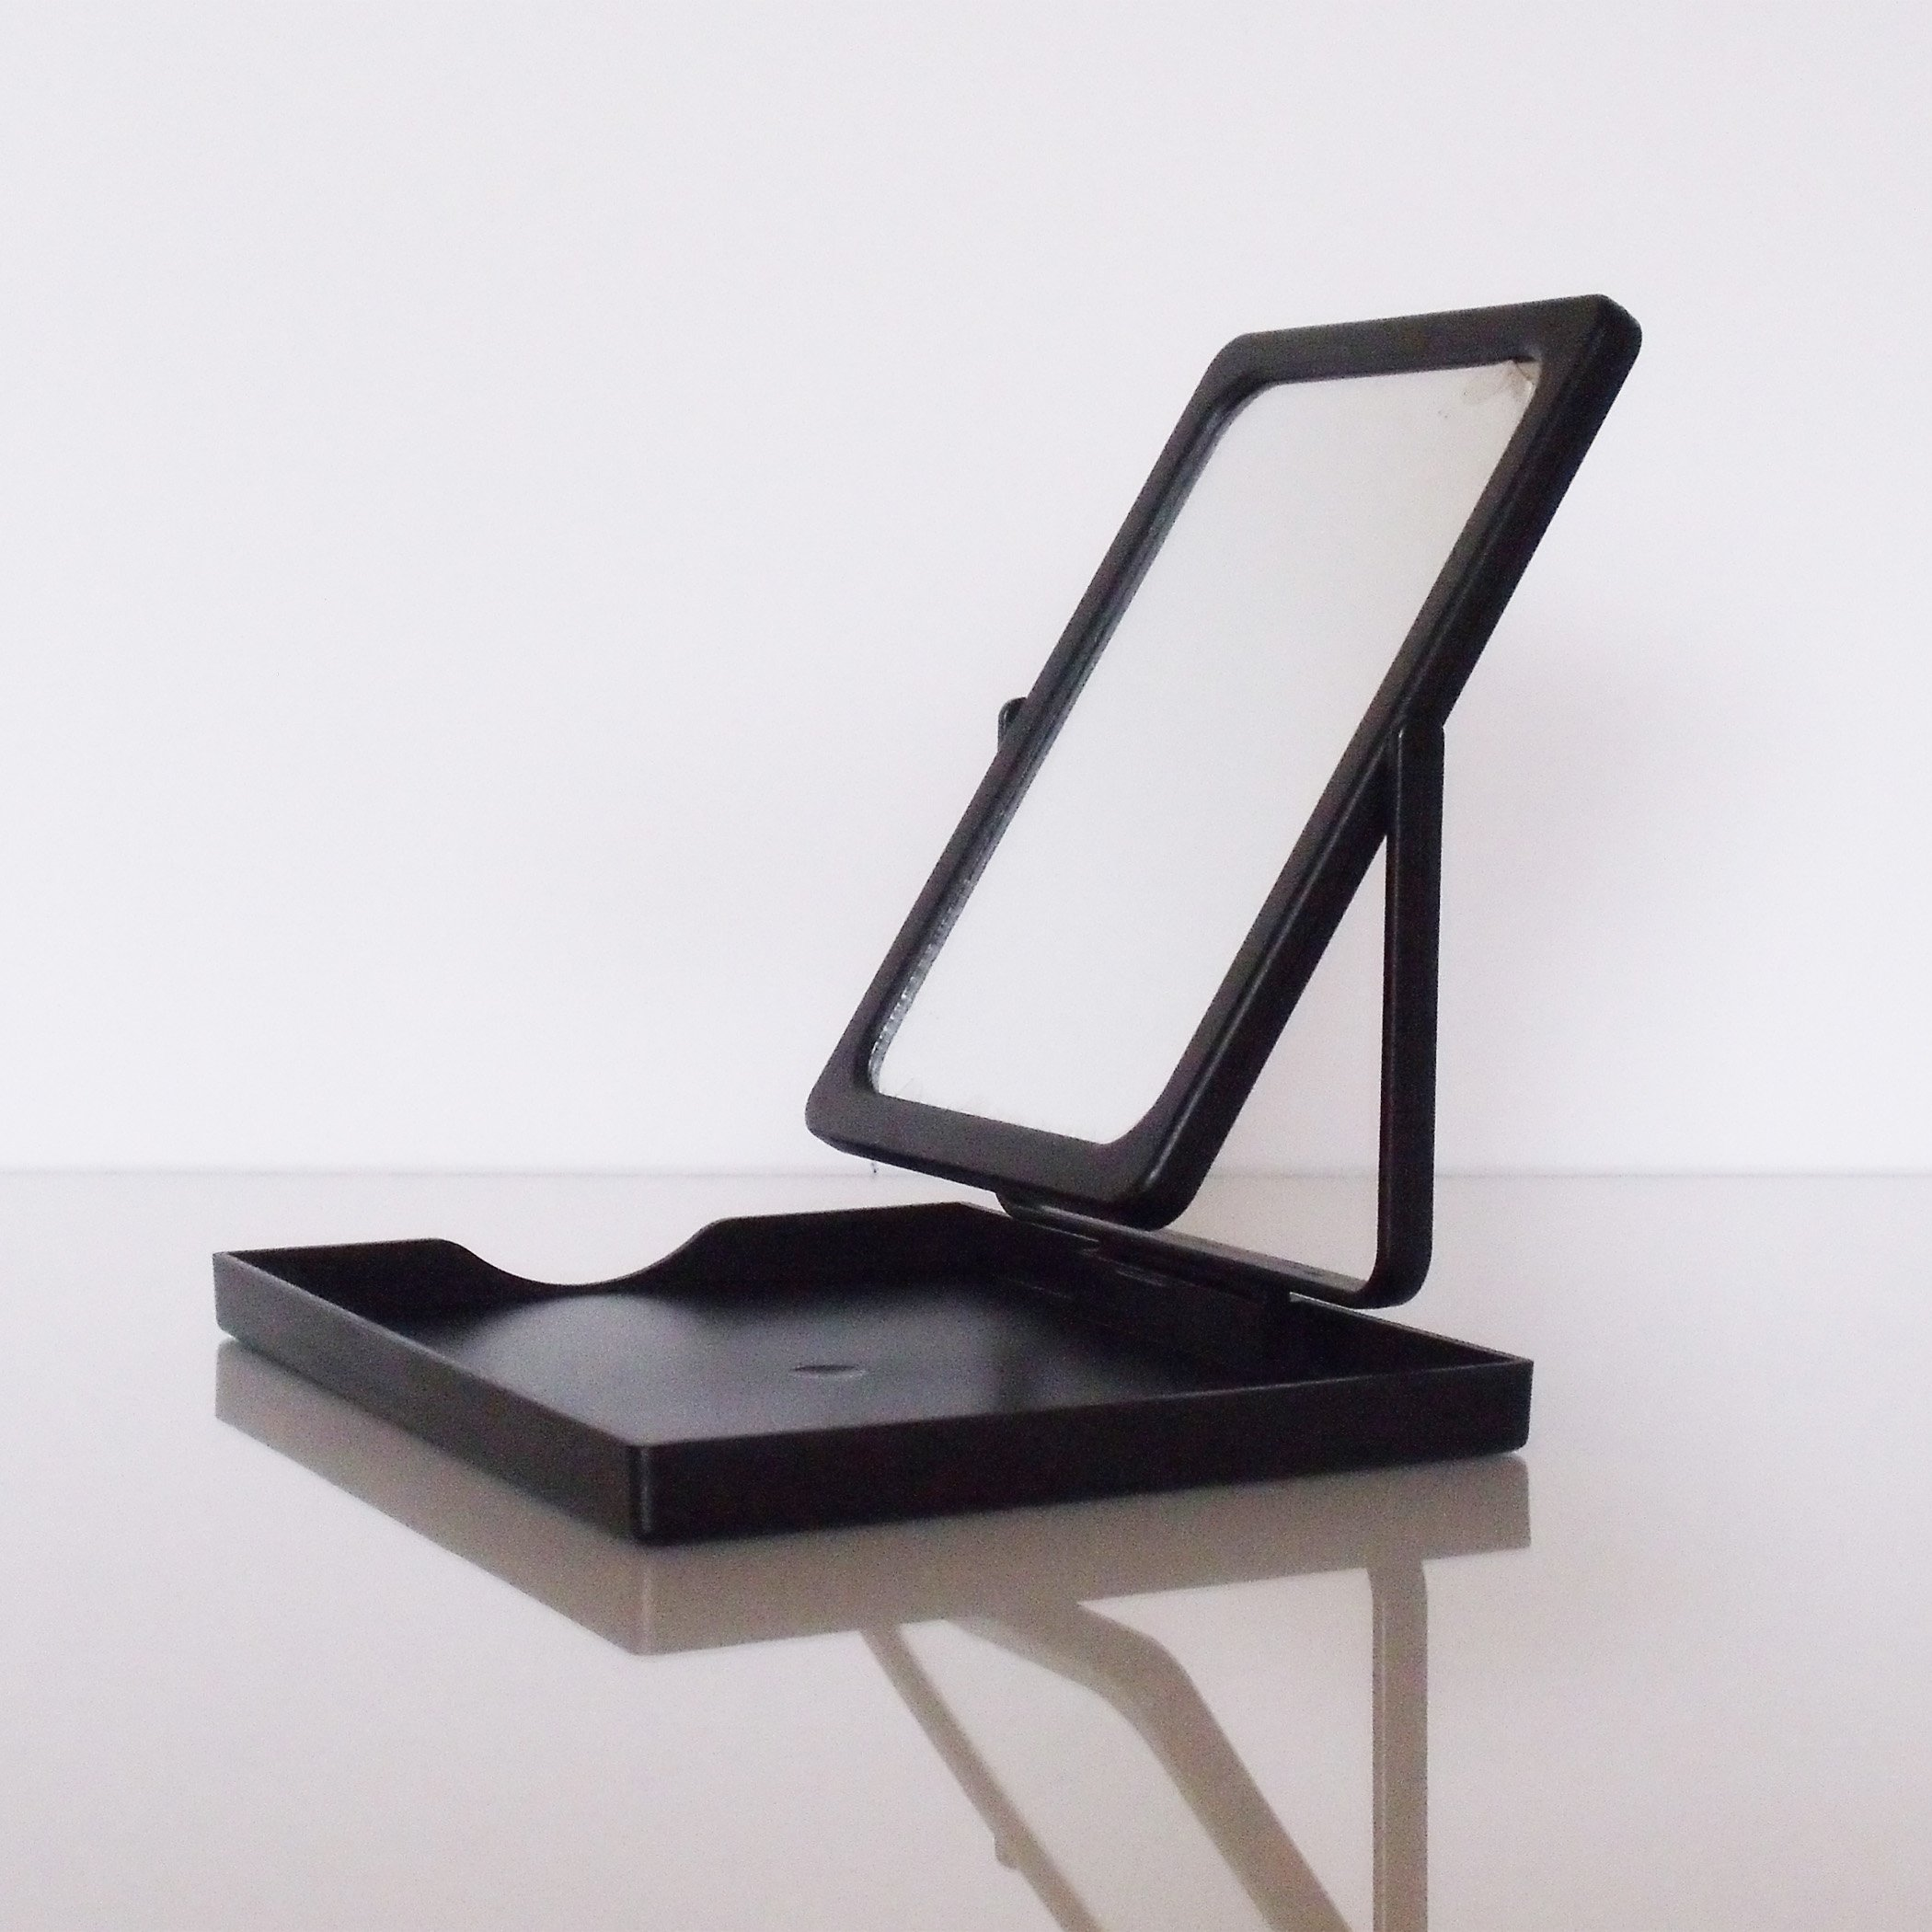 subscription box swaps mary kay portable makeup mirrors